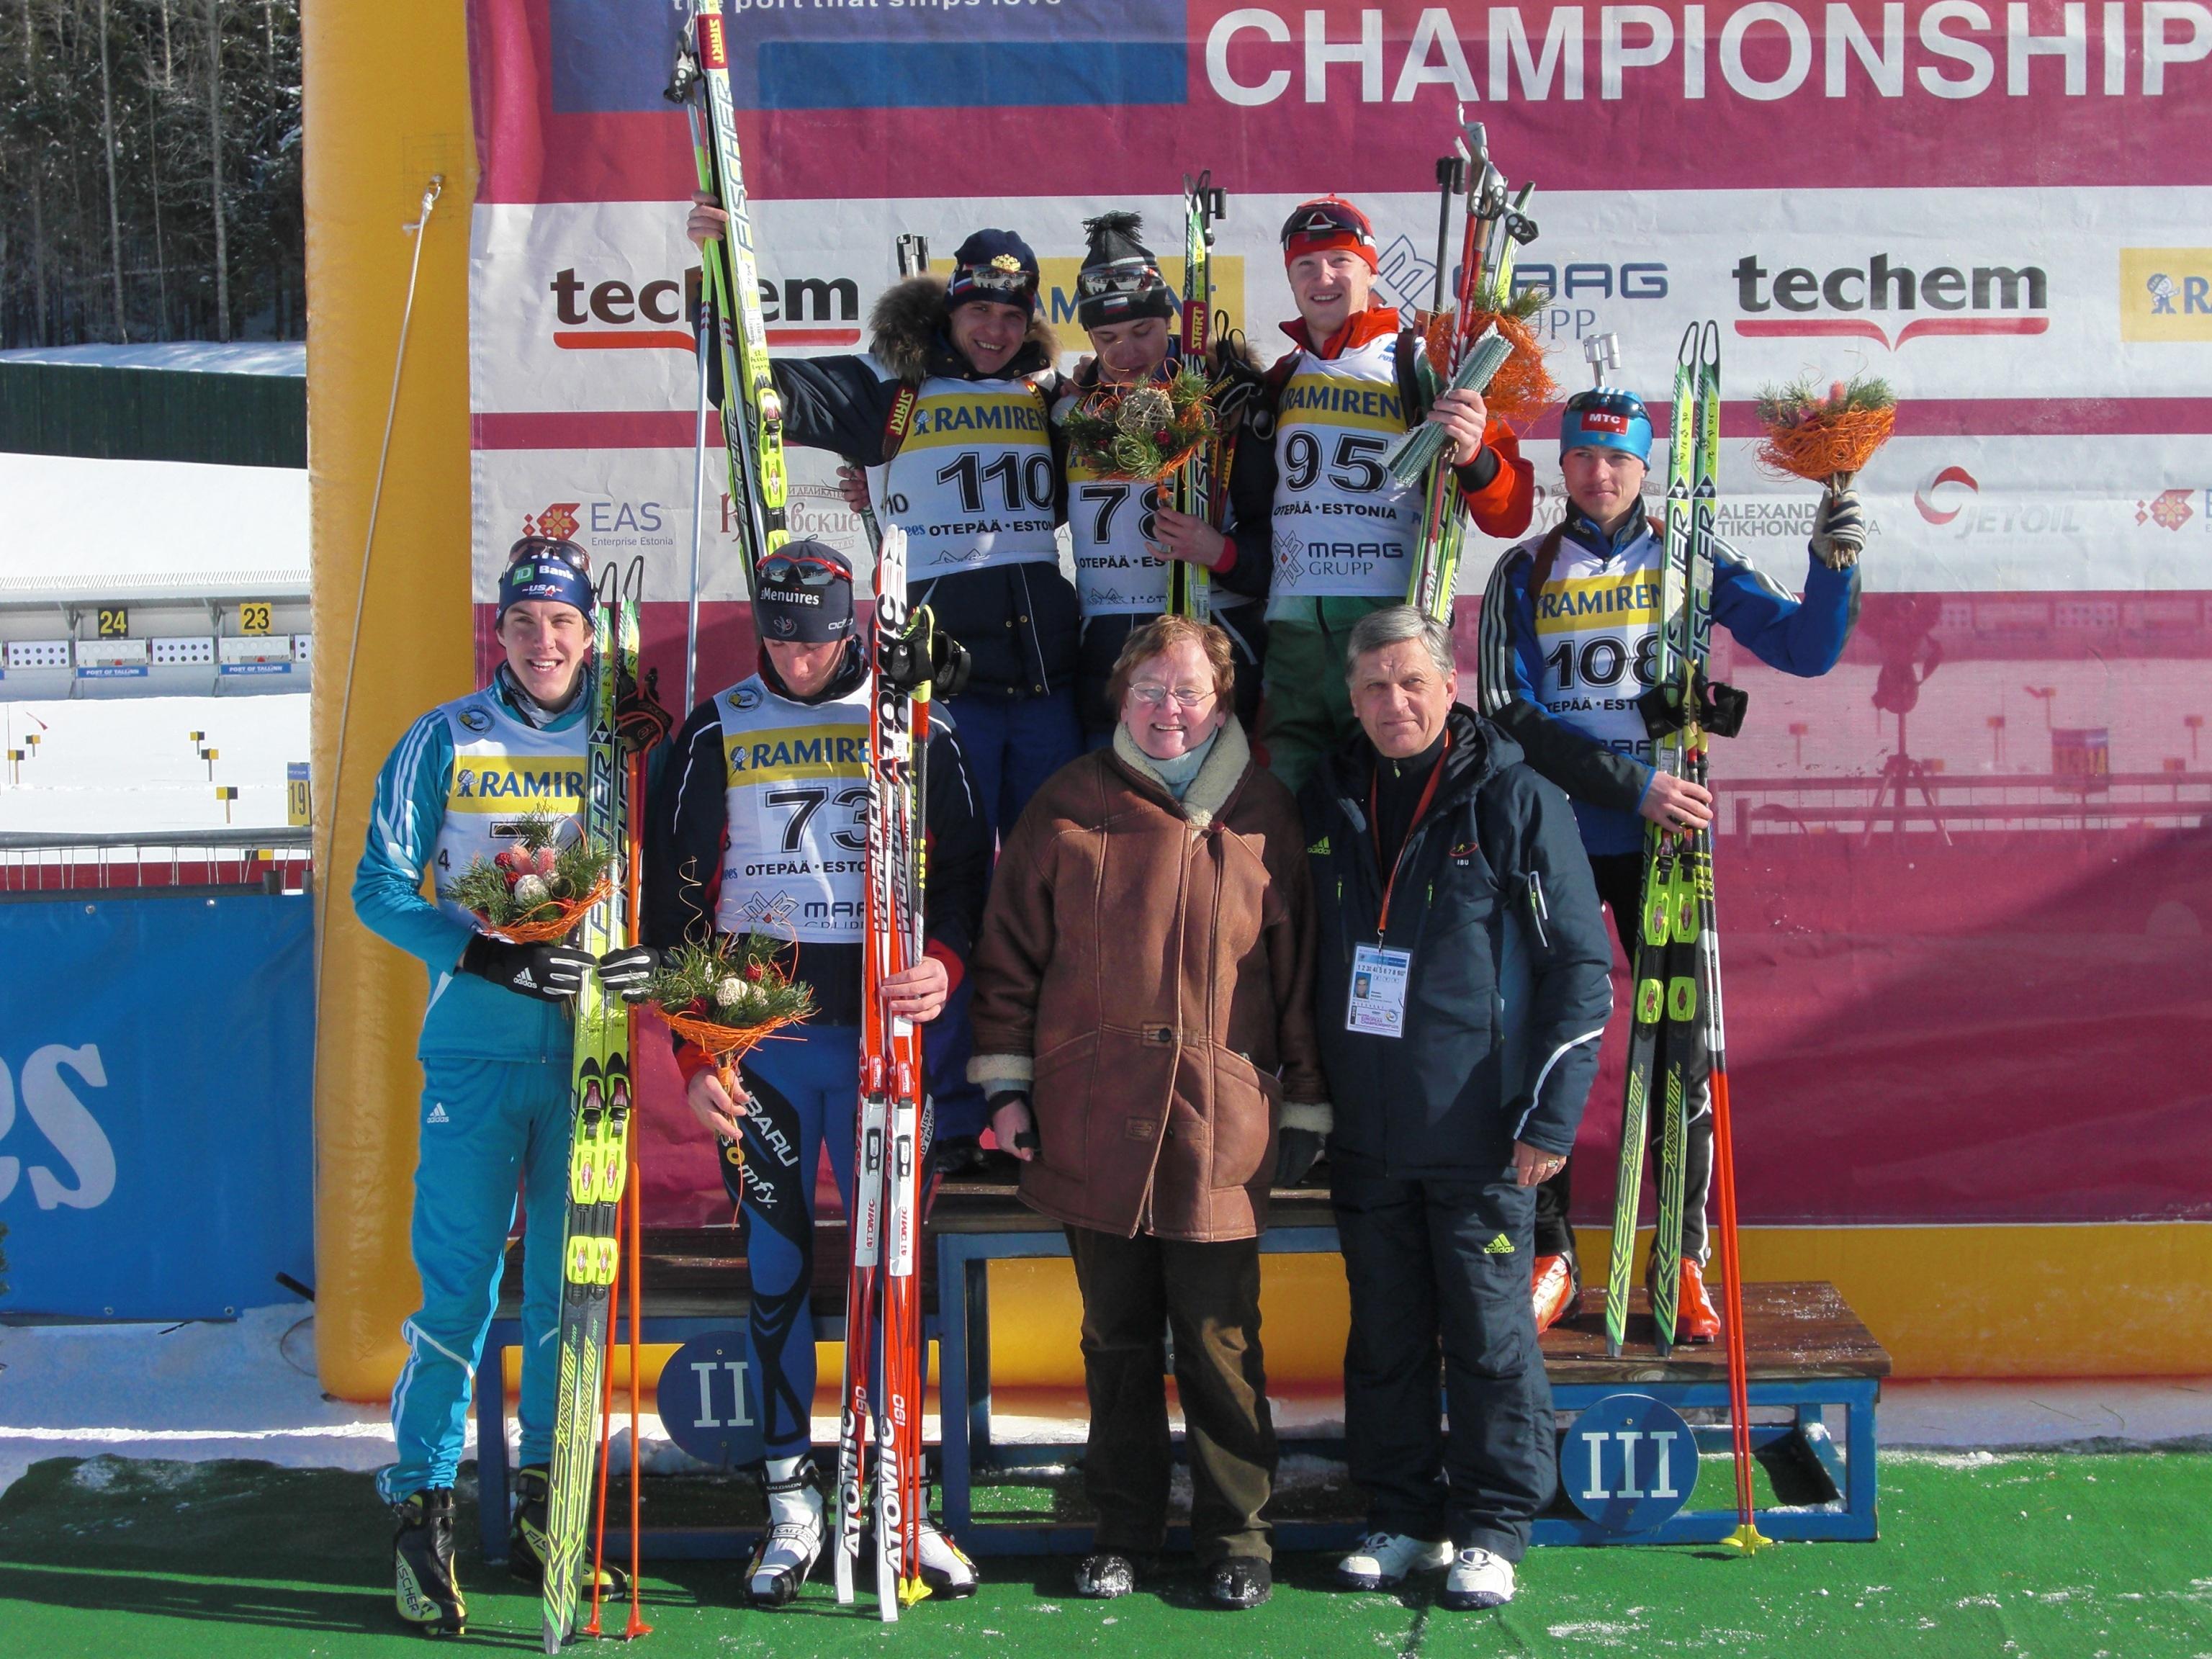 https://fasterskier.com/wp-content/blogs.dir/1/files/2010/11/IBU-podium.jpg